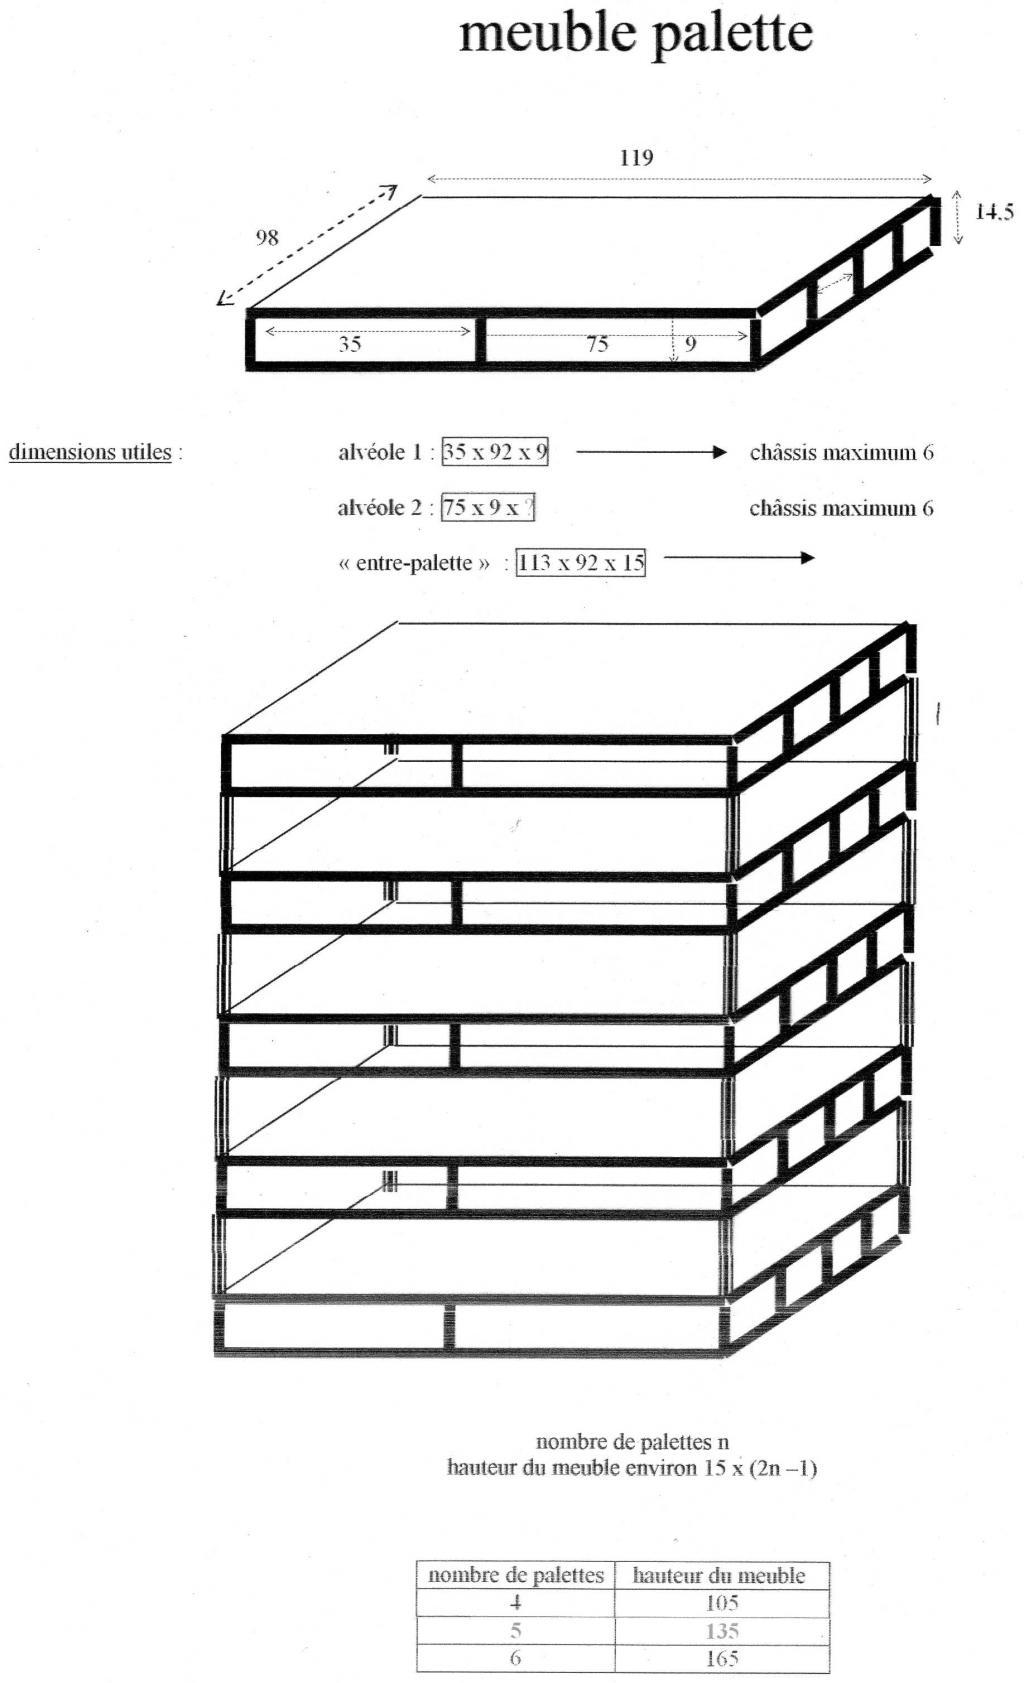 poids palette bois 80 120 bande transporteuse caoutchouc. Black Bedroom Furniture Sets. Home Design Ideas